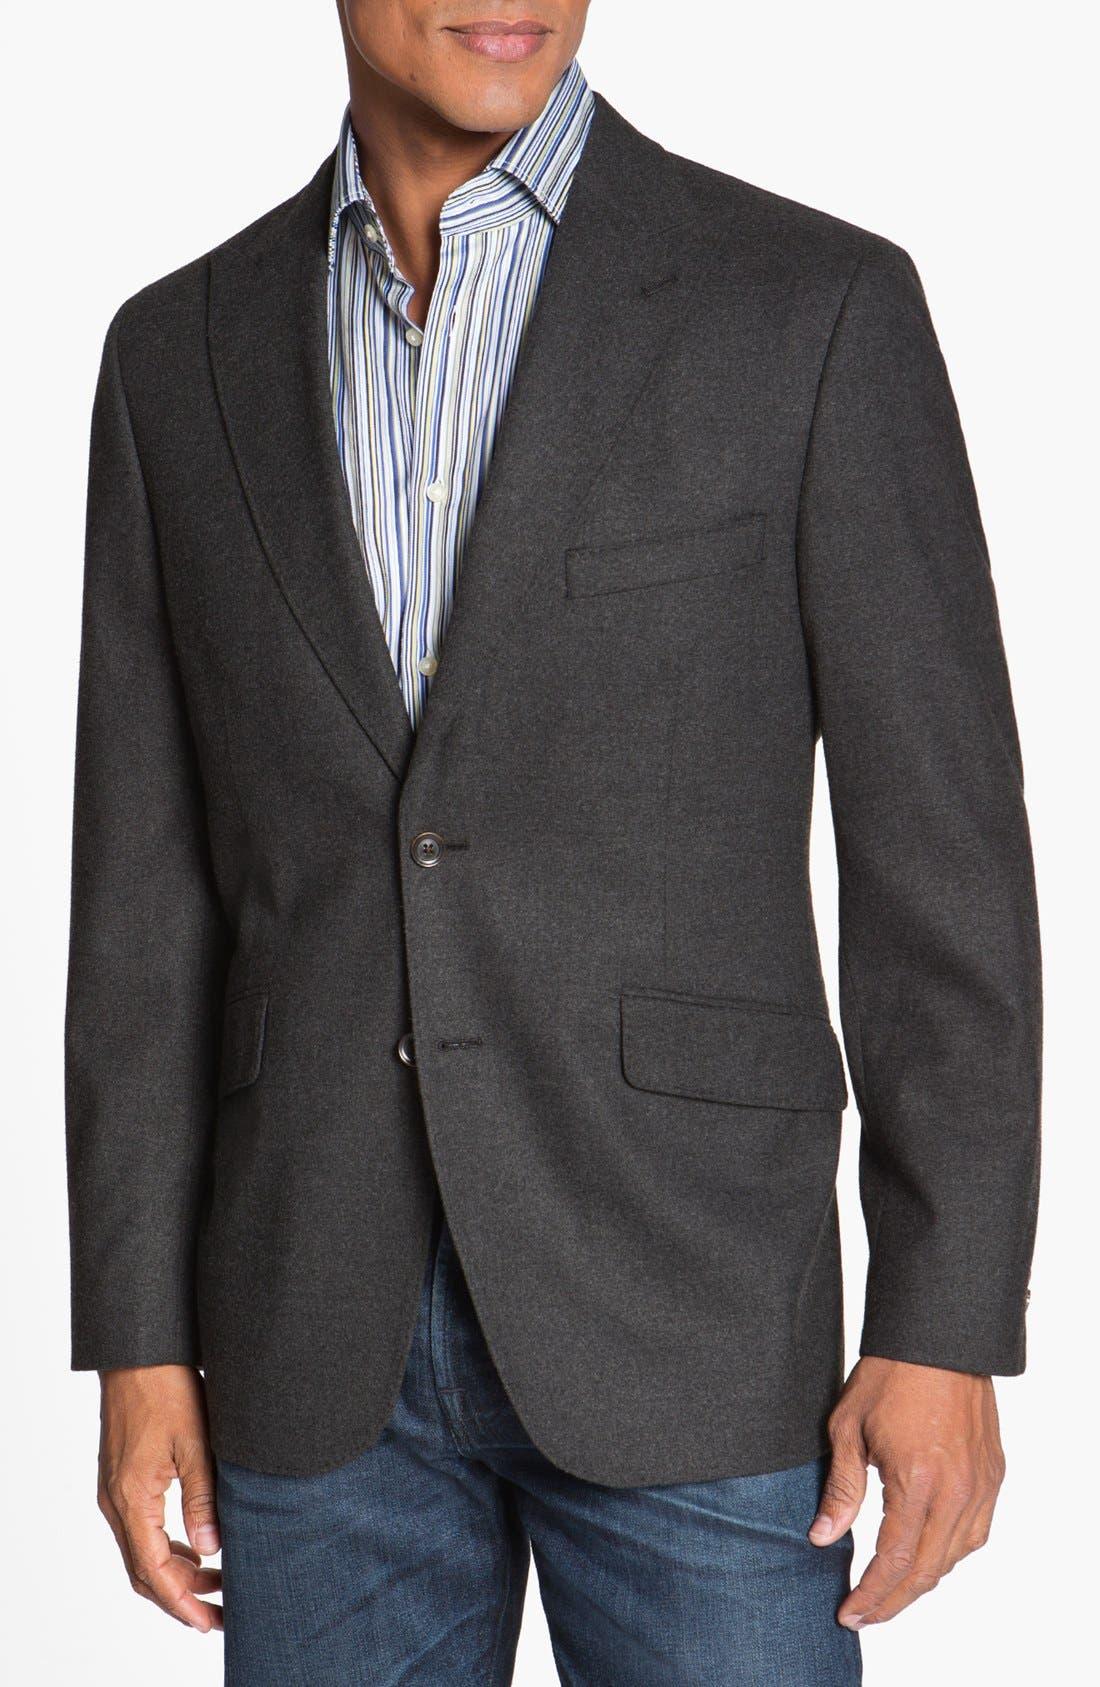 Main Image - Kroon 'Cooke' Wool Blend Sportcoat